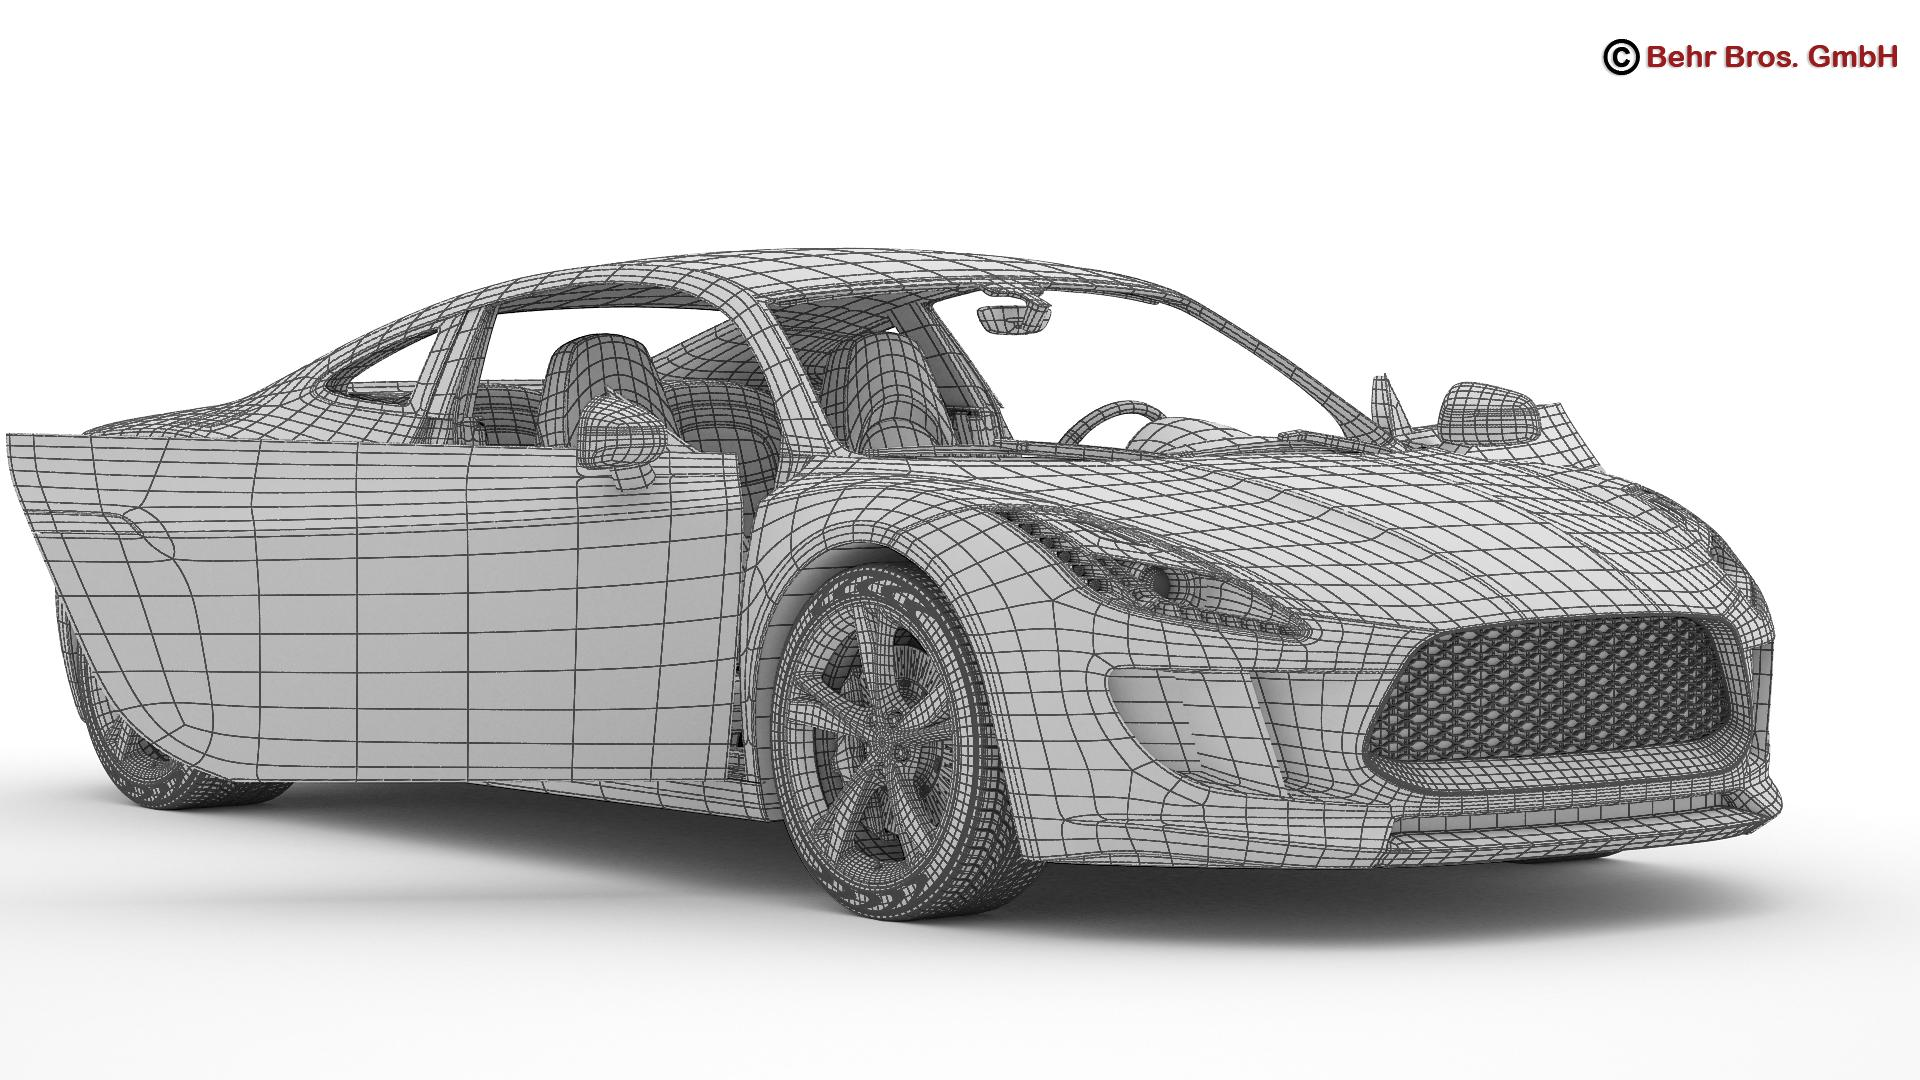 generic sports car 3d model 3ds max fbx c4d lwo ma mb obj 160536